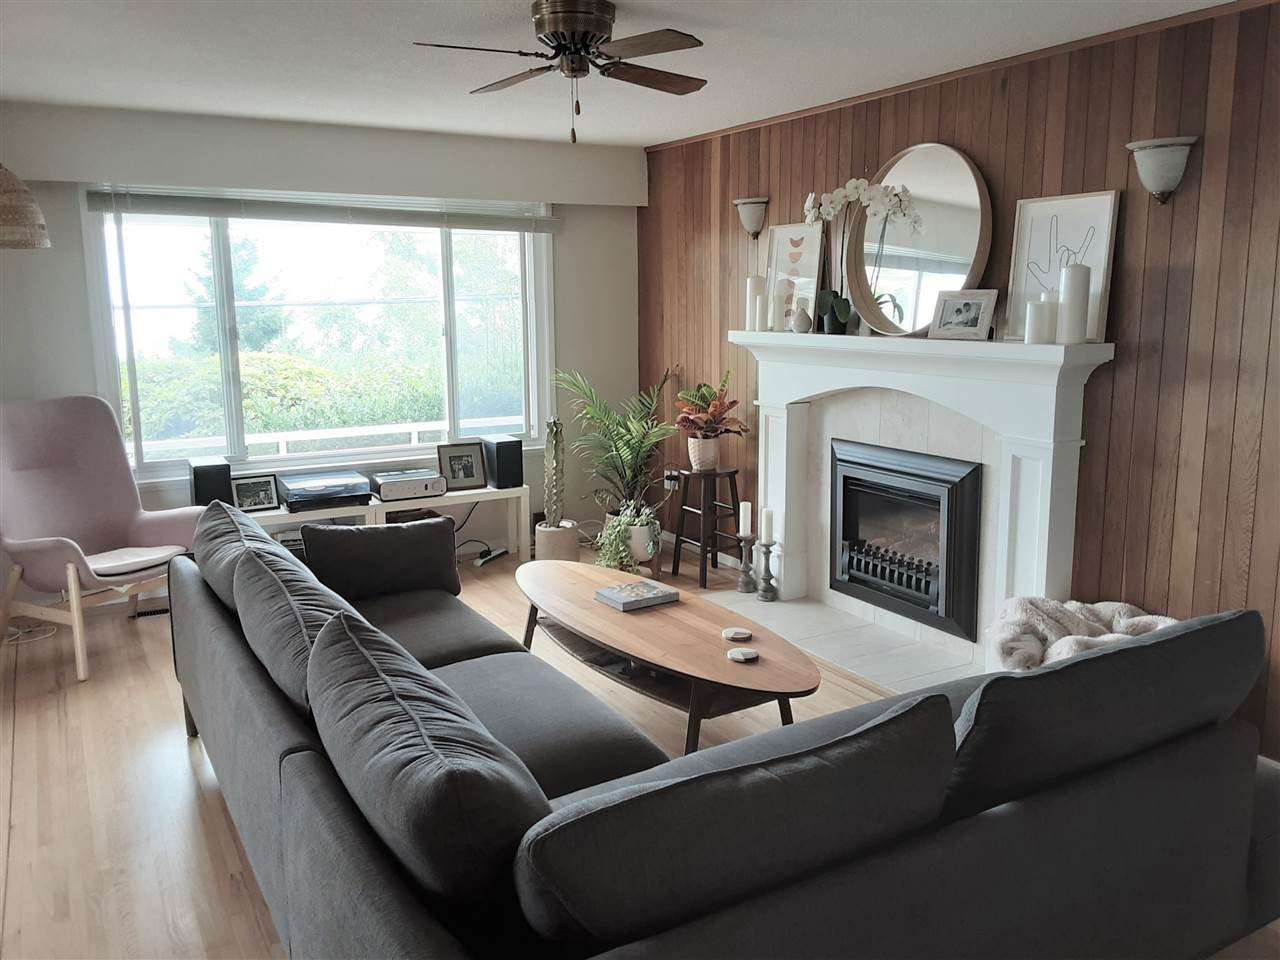 Photo 12: Photos: 15291 COLUMBIA Avenue: White Rock House for sale (South Surrey White Rock)  : MLS®# R2492863